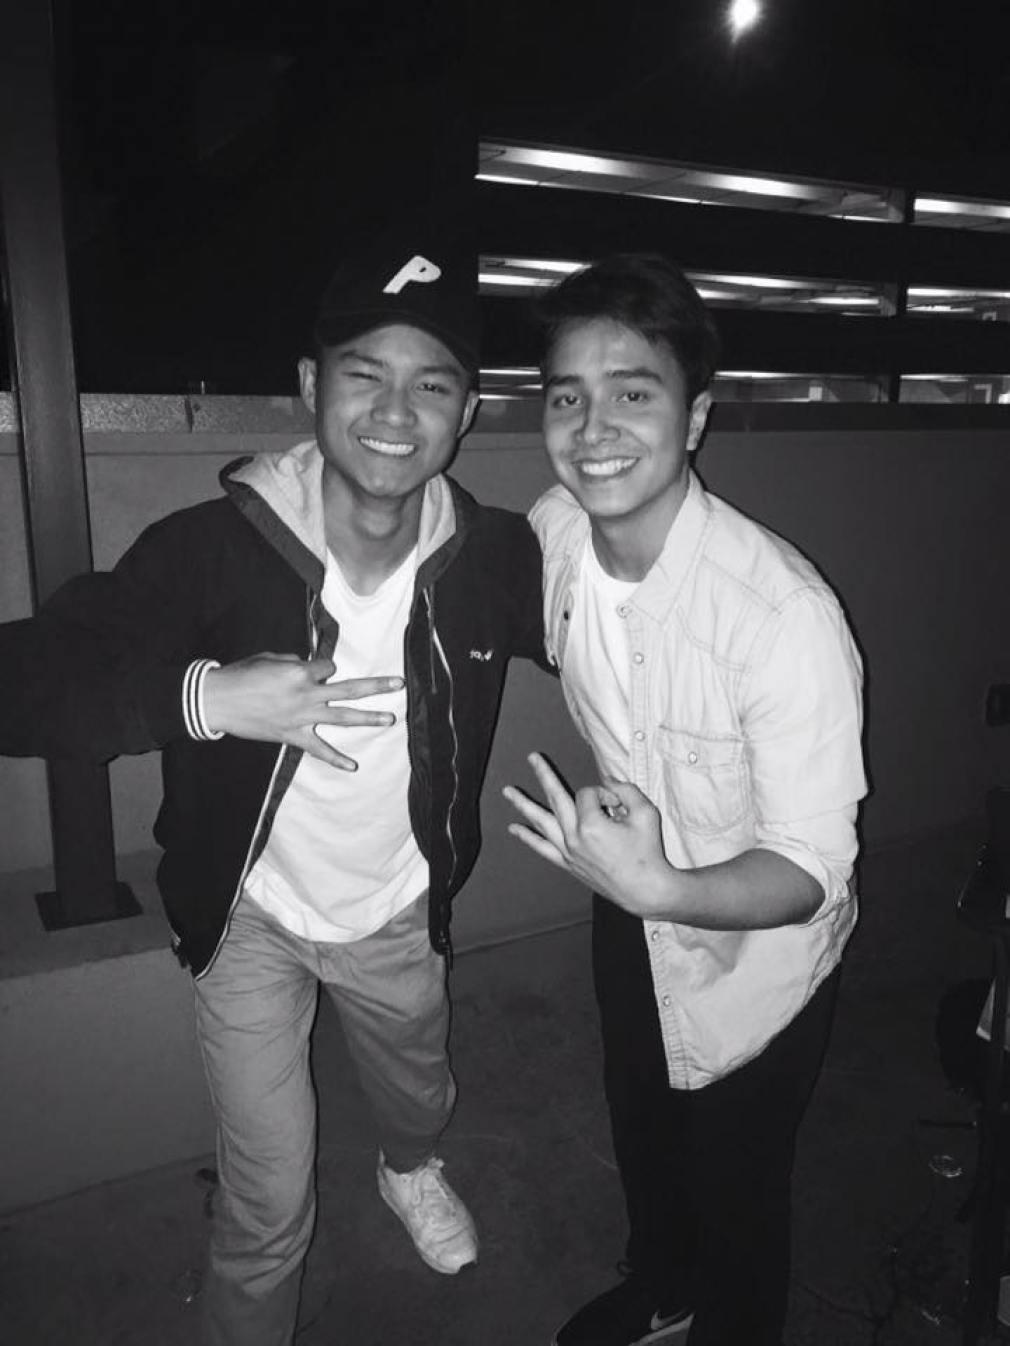 Jeff Maqui (left), UT Finance Sophomore, rocks a Palace hat